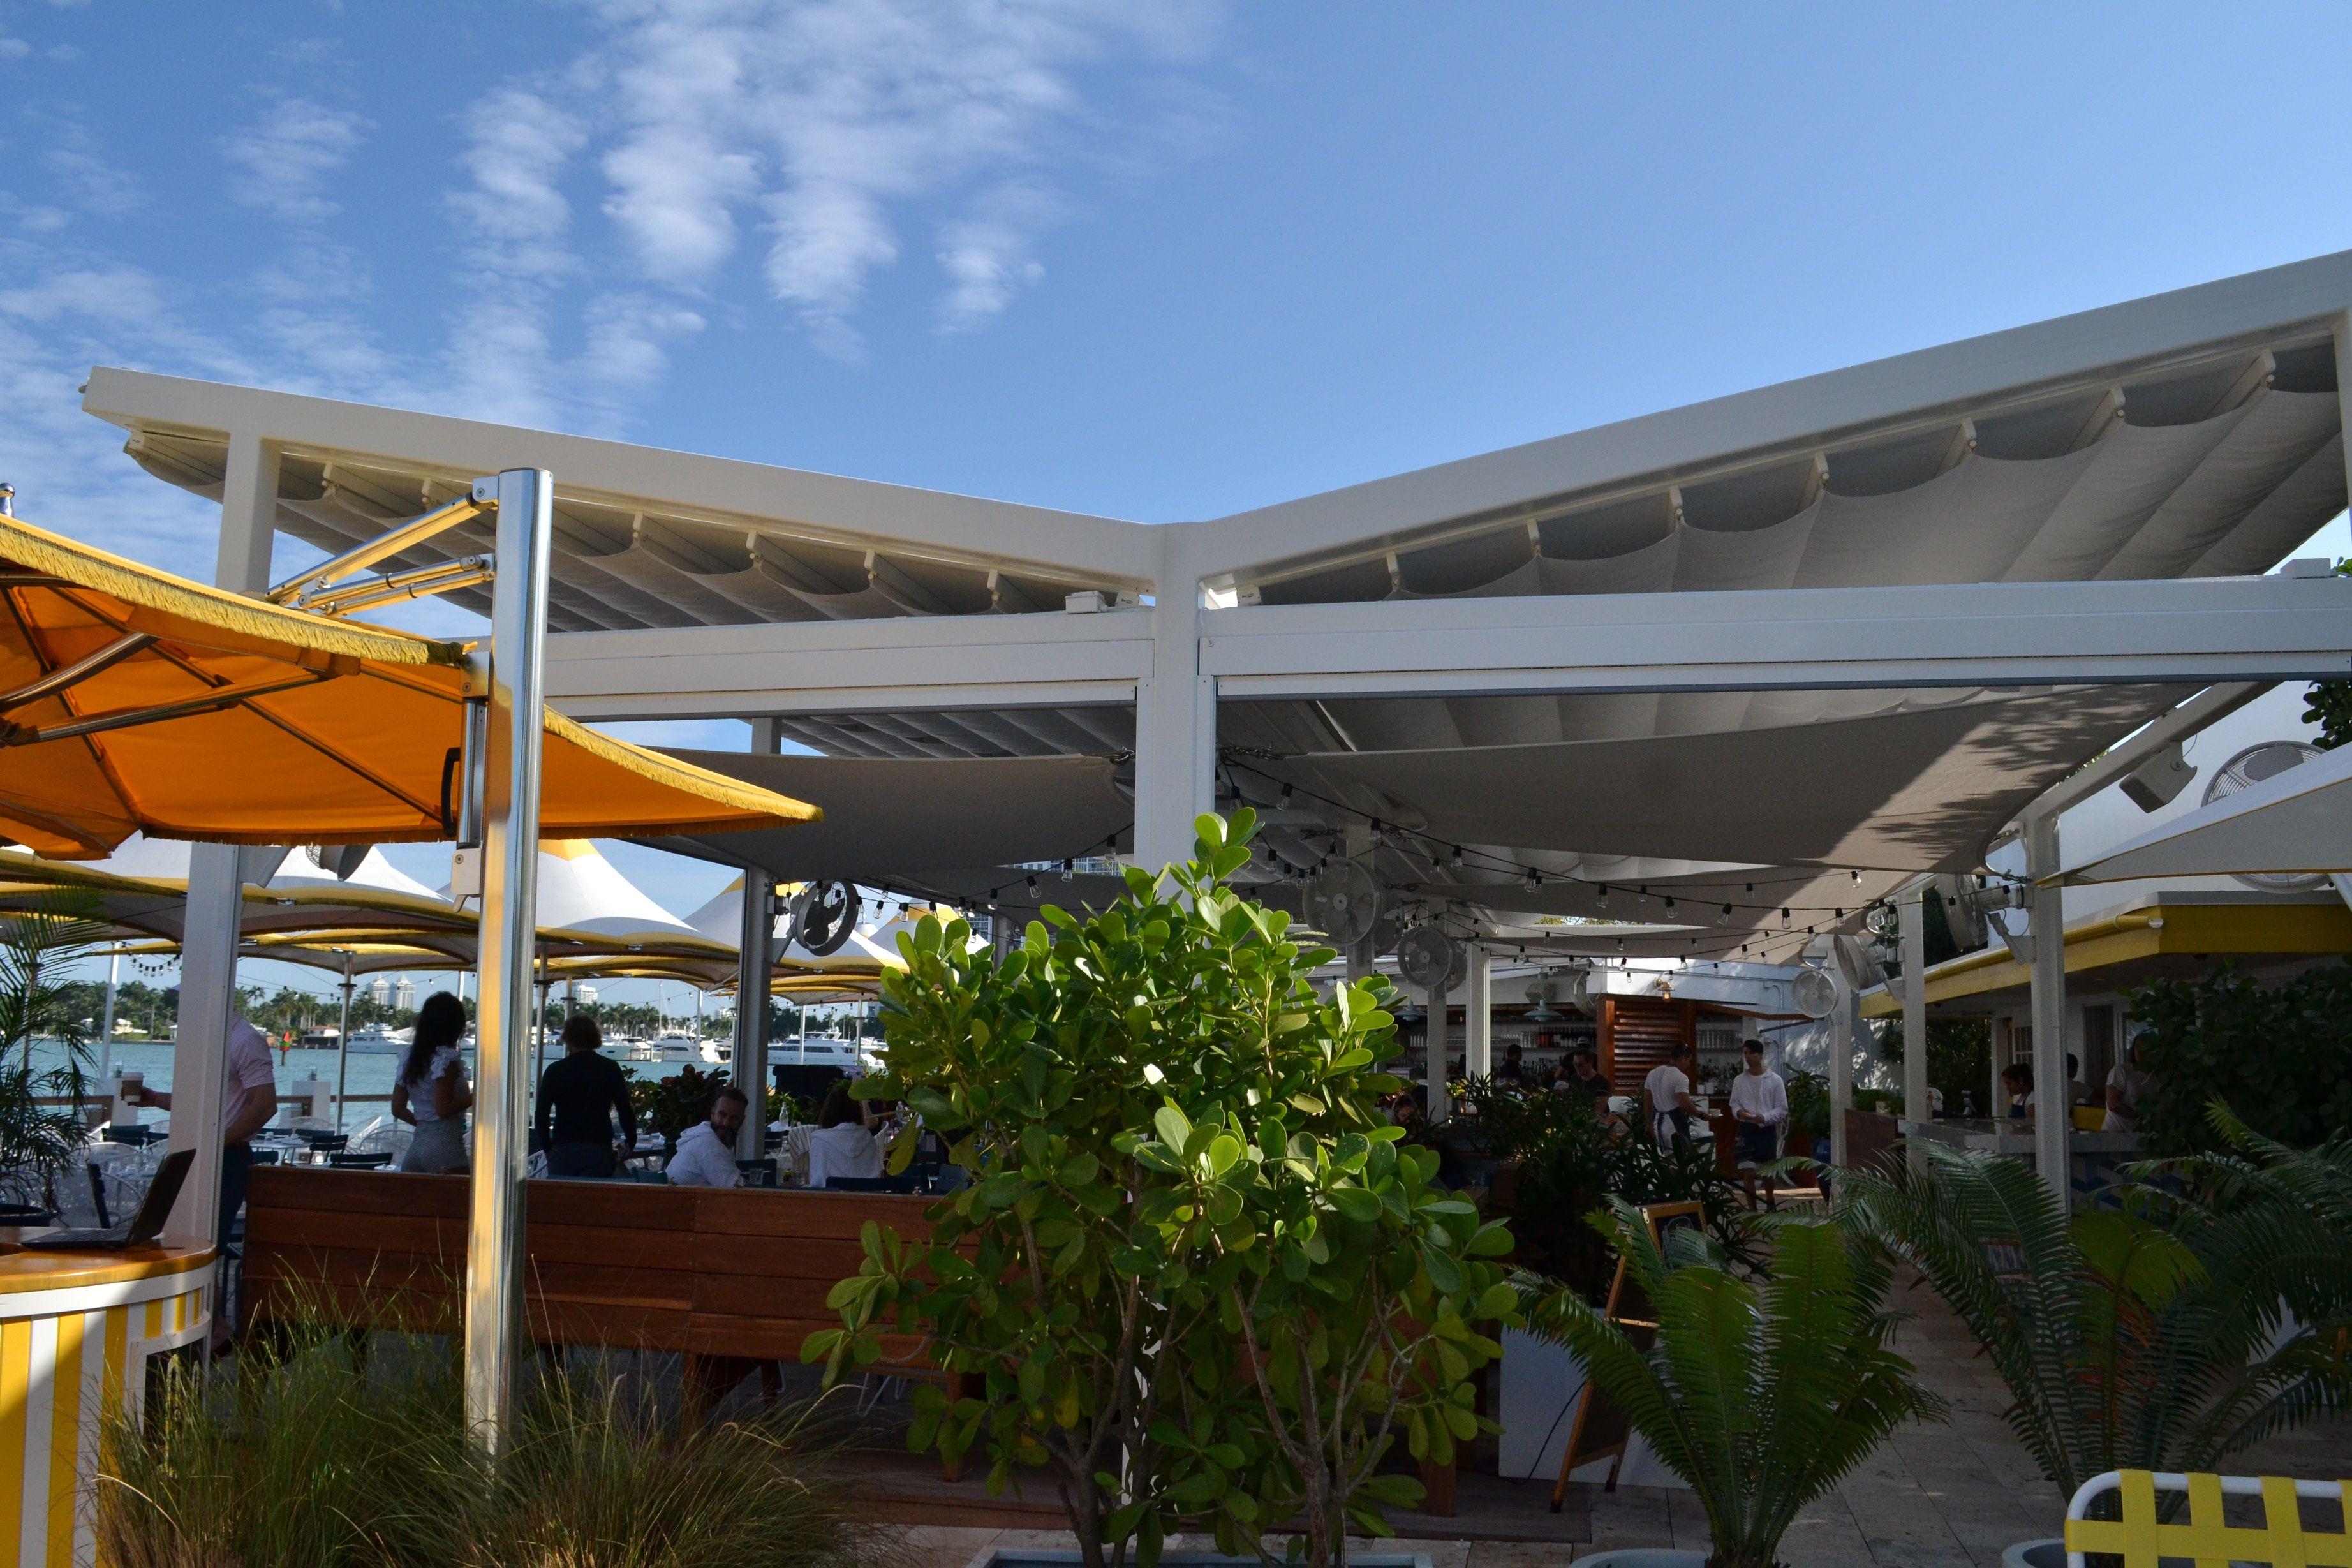 Retractable Roof Systems And Pergolas Pergola Ideas For Patio Pergola Shade Pergola